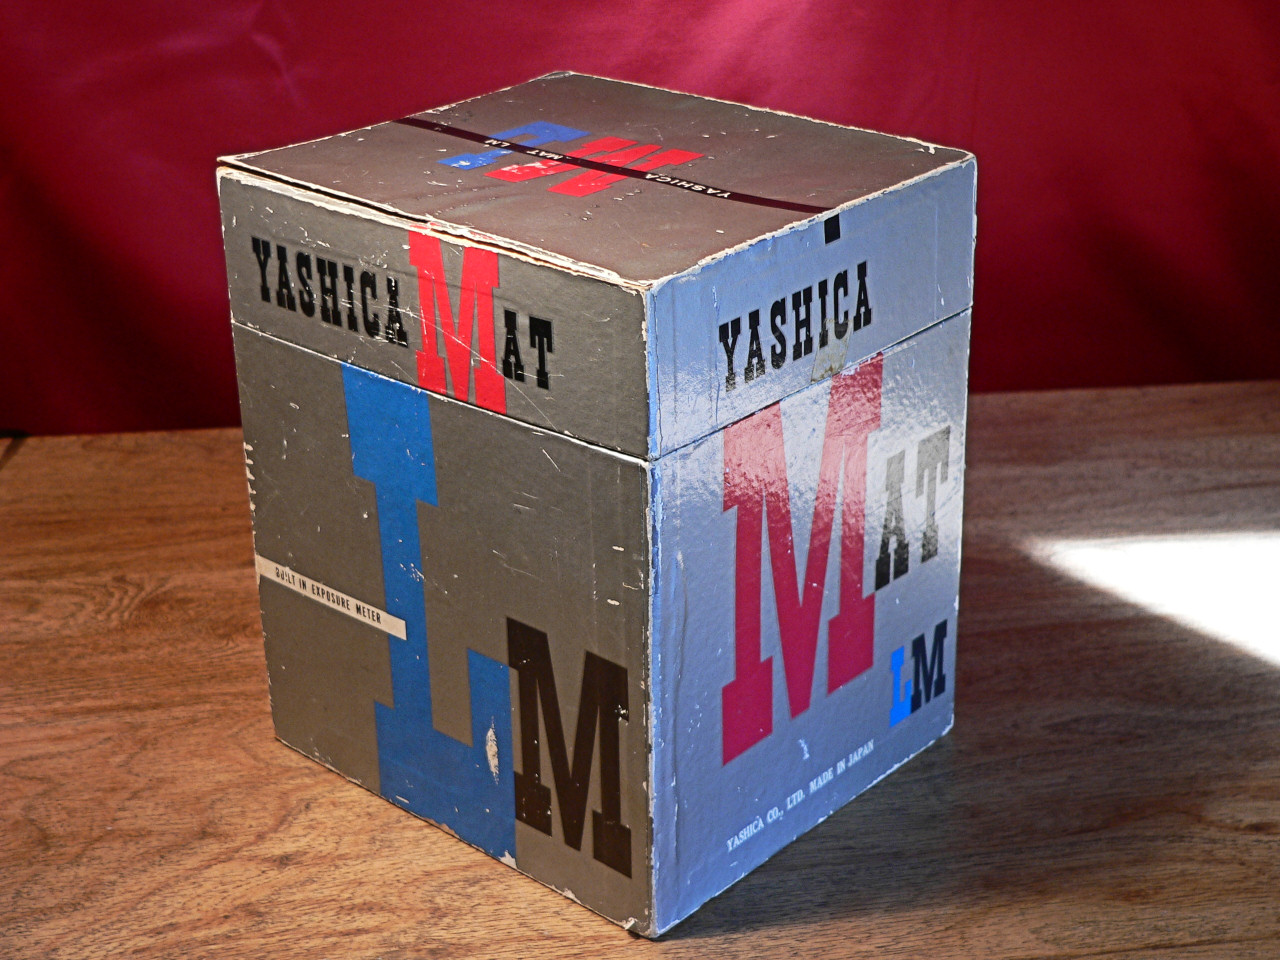 Yashica Mat LM TLR 6x6 Medium Format 120mm Roll Film Original Box (1958-1960]